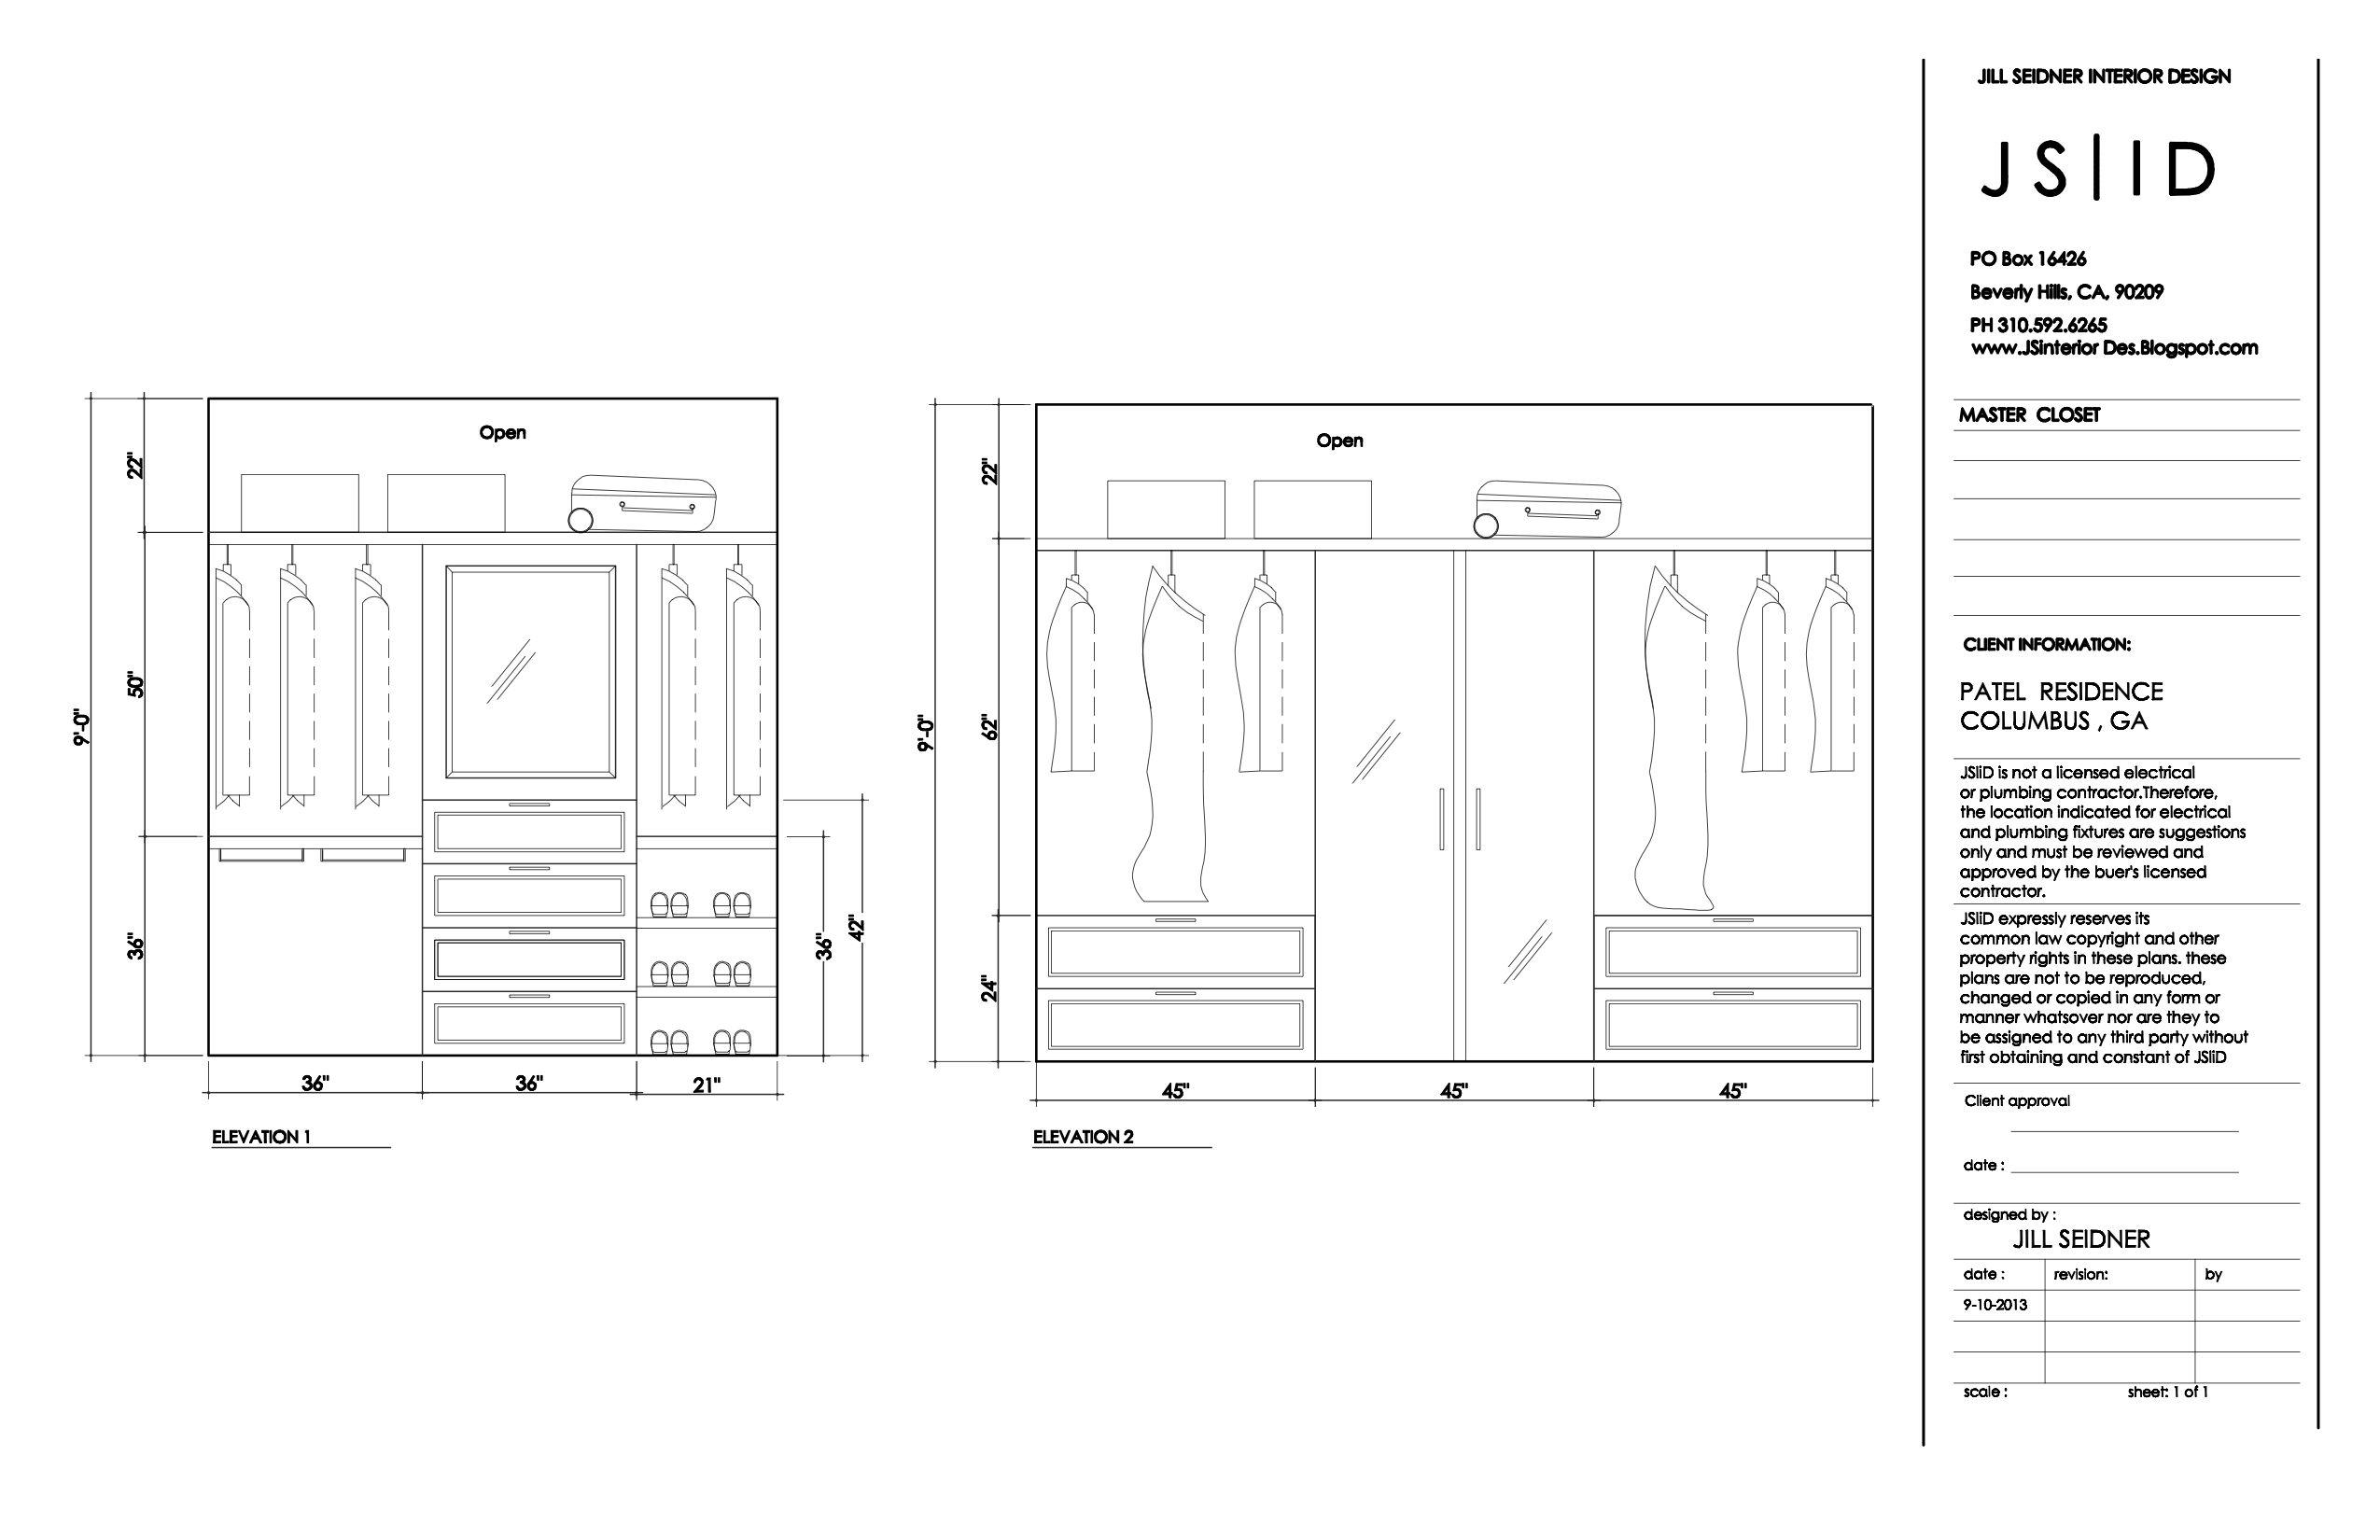 for tedxumkc walk decoration closet plans ideas small design image of in bedroom